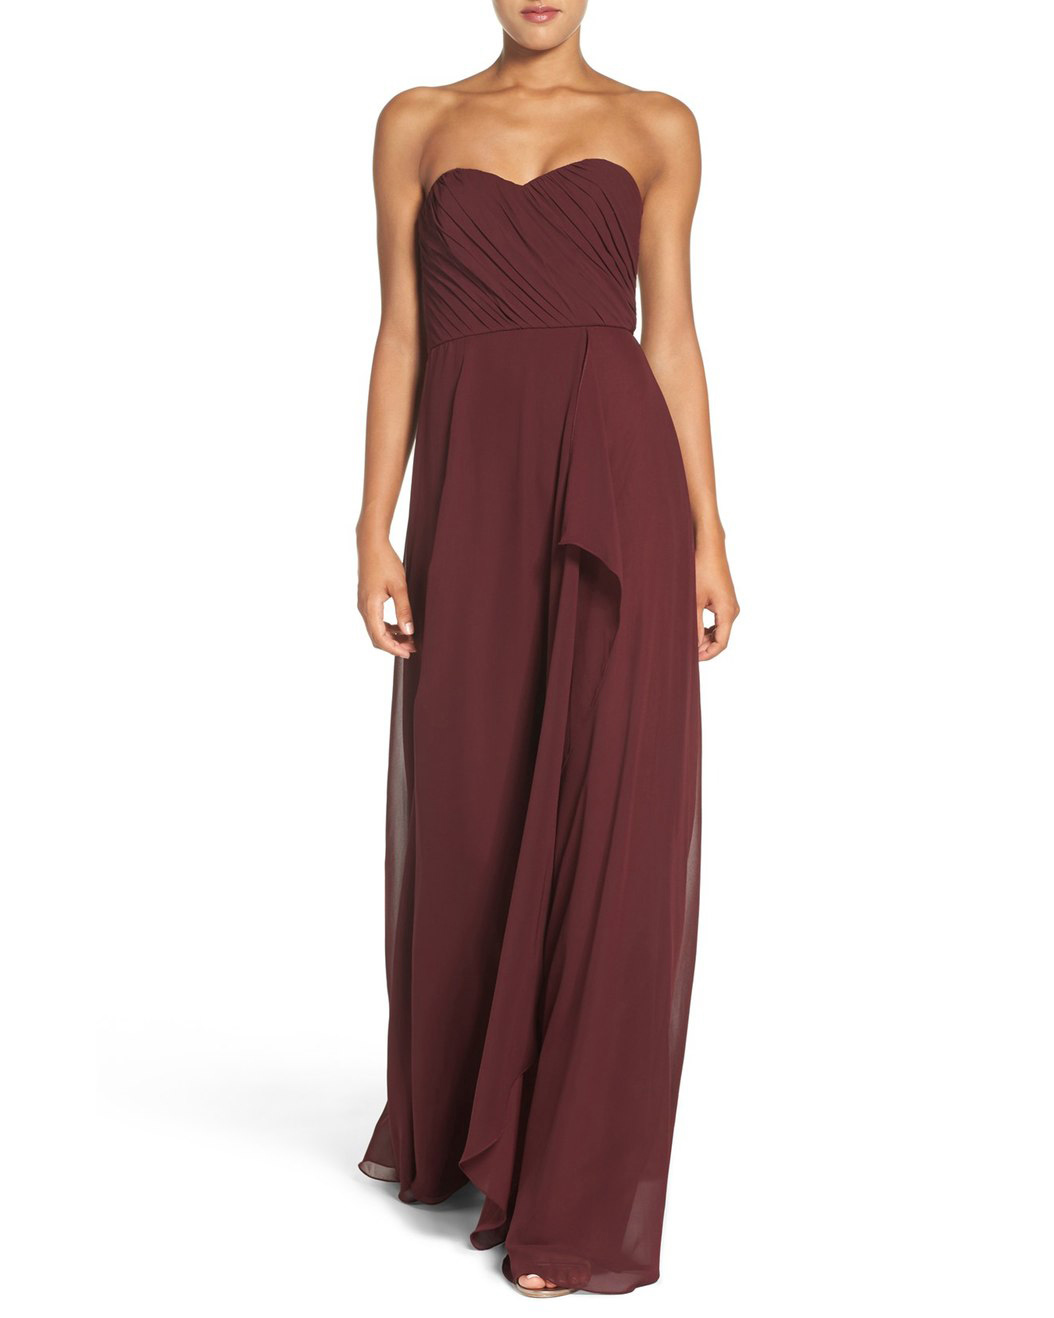 "burgundy bridesmaid dress – Amsale ""Jaycie"" Drape Strapless Chiffon Gown"